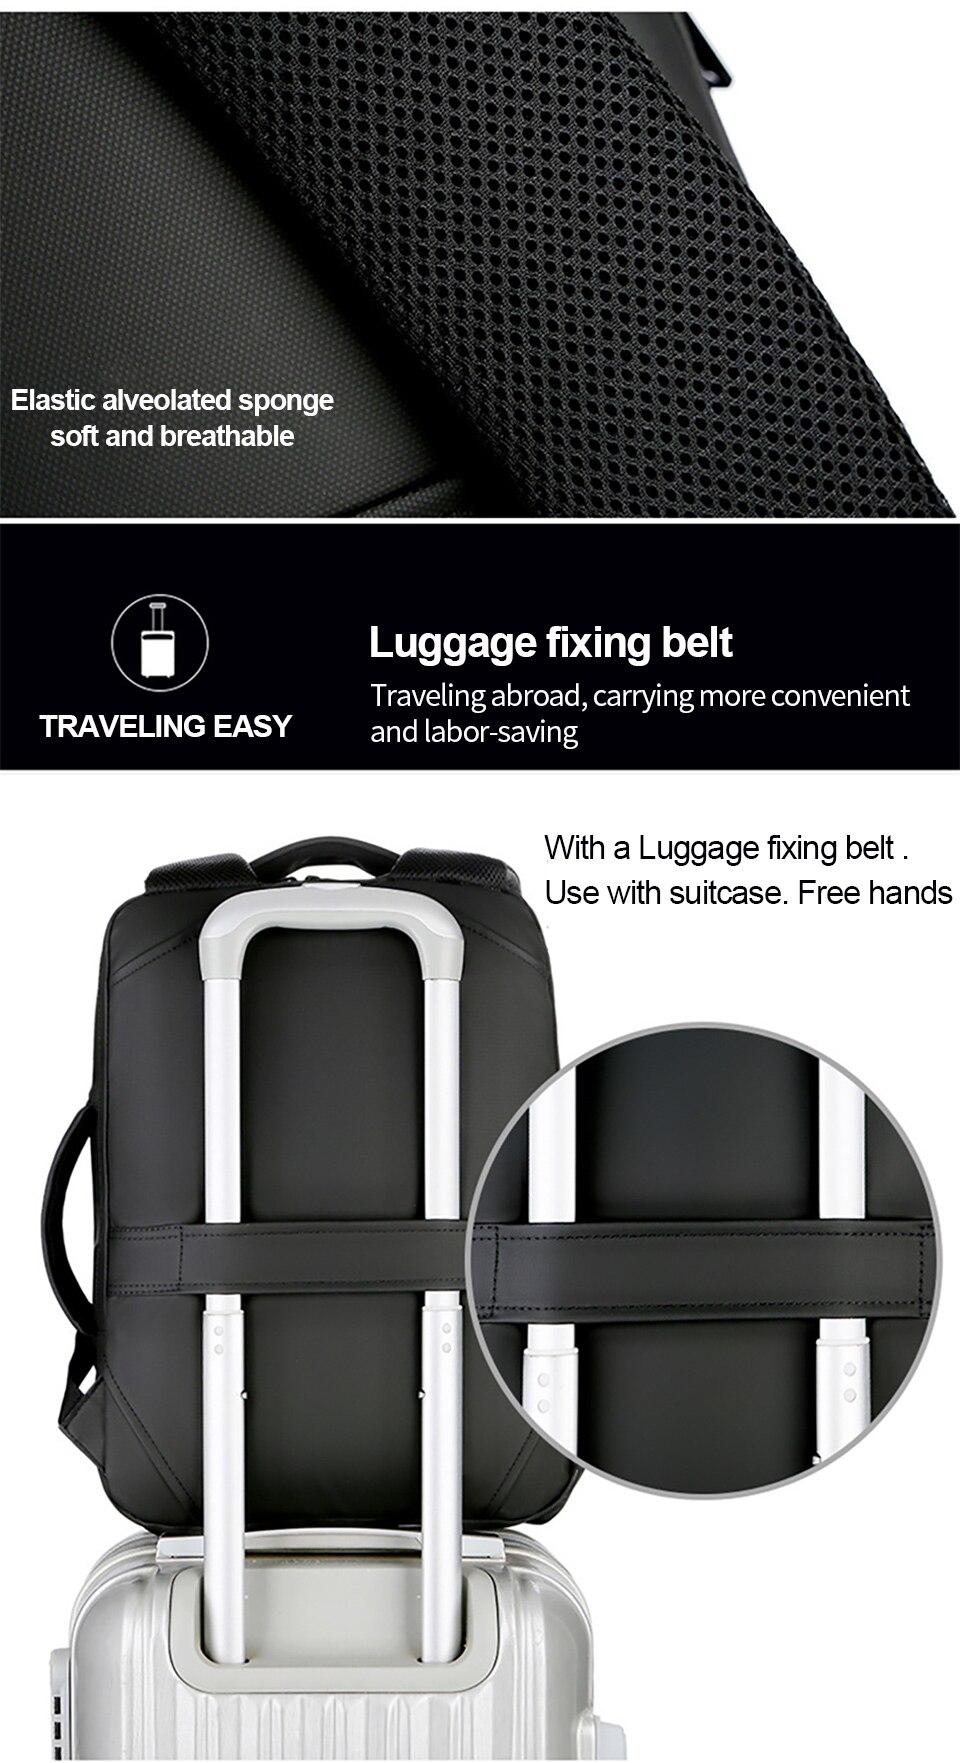 5 Multifunction USB Backpack Man Bag 15.6inch Laptop Backpacks Travel Bags Large Capacity Luggage Backpacking Waterproof Notebook